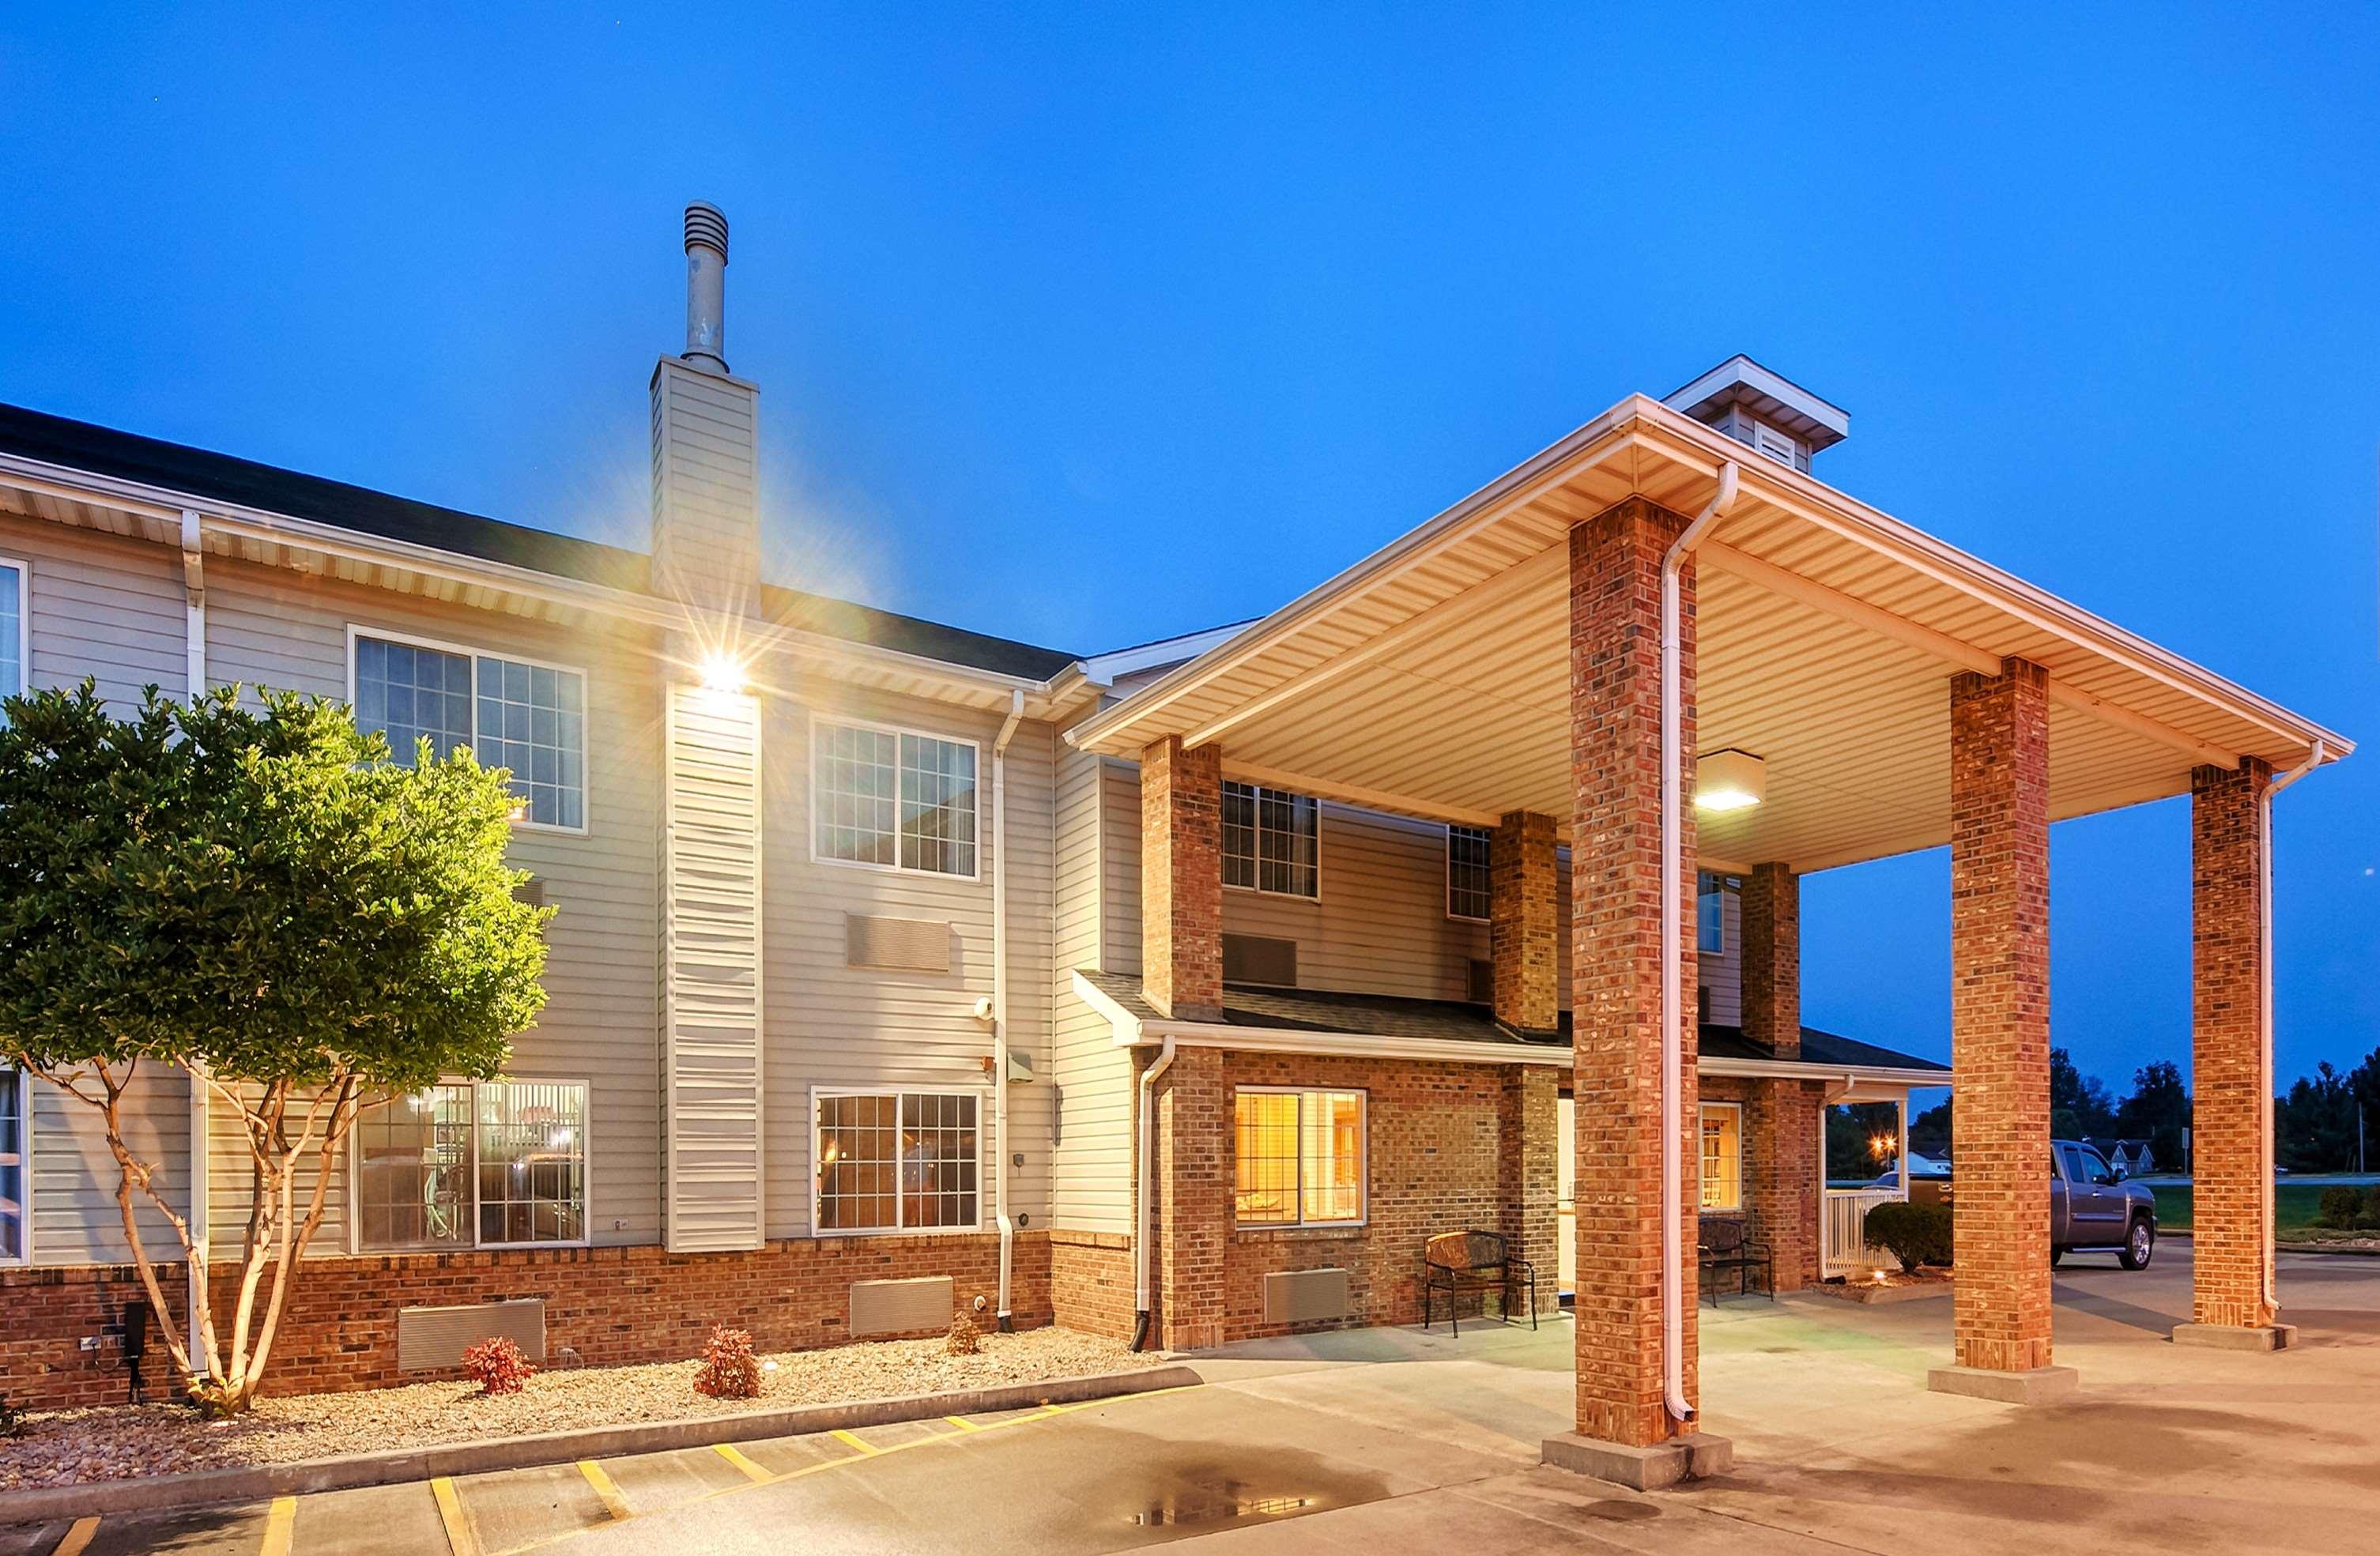 Best Western Lorson Inn image 1